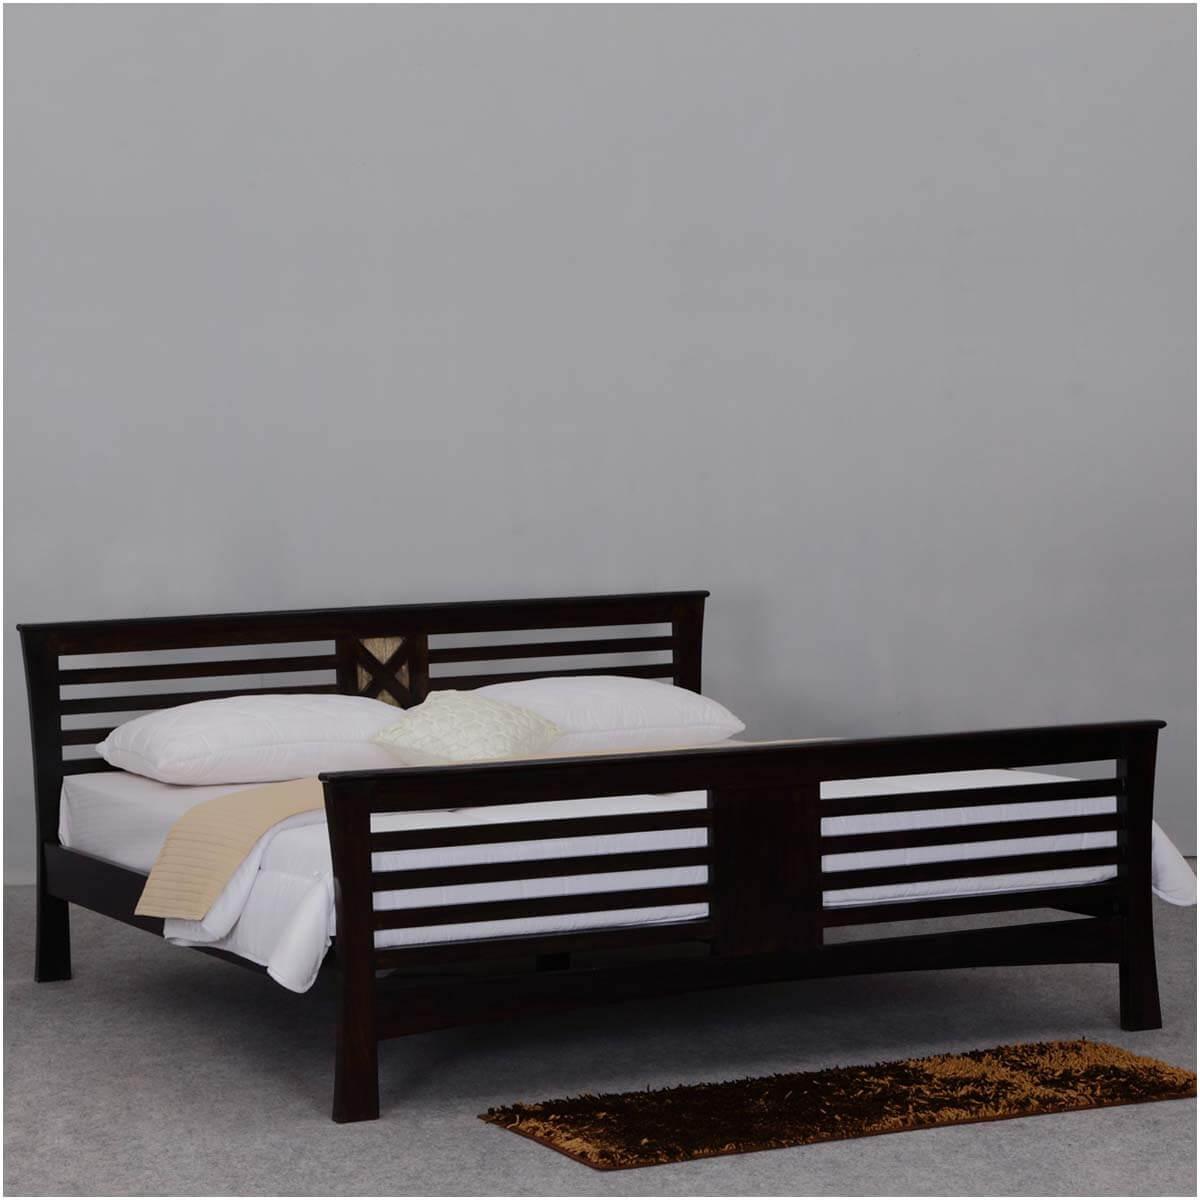 Texas Solid Wood King Size Platform Bed Frame W Headboard